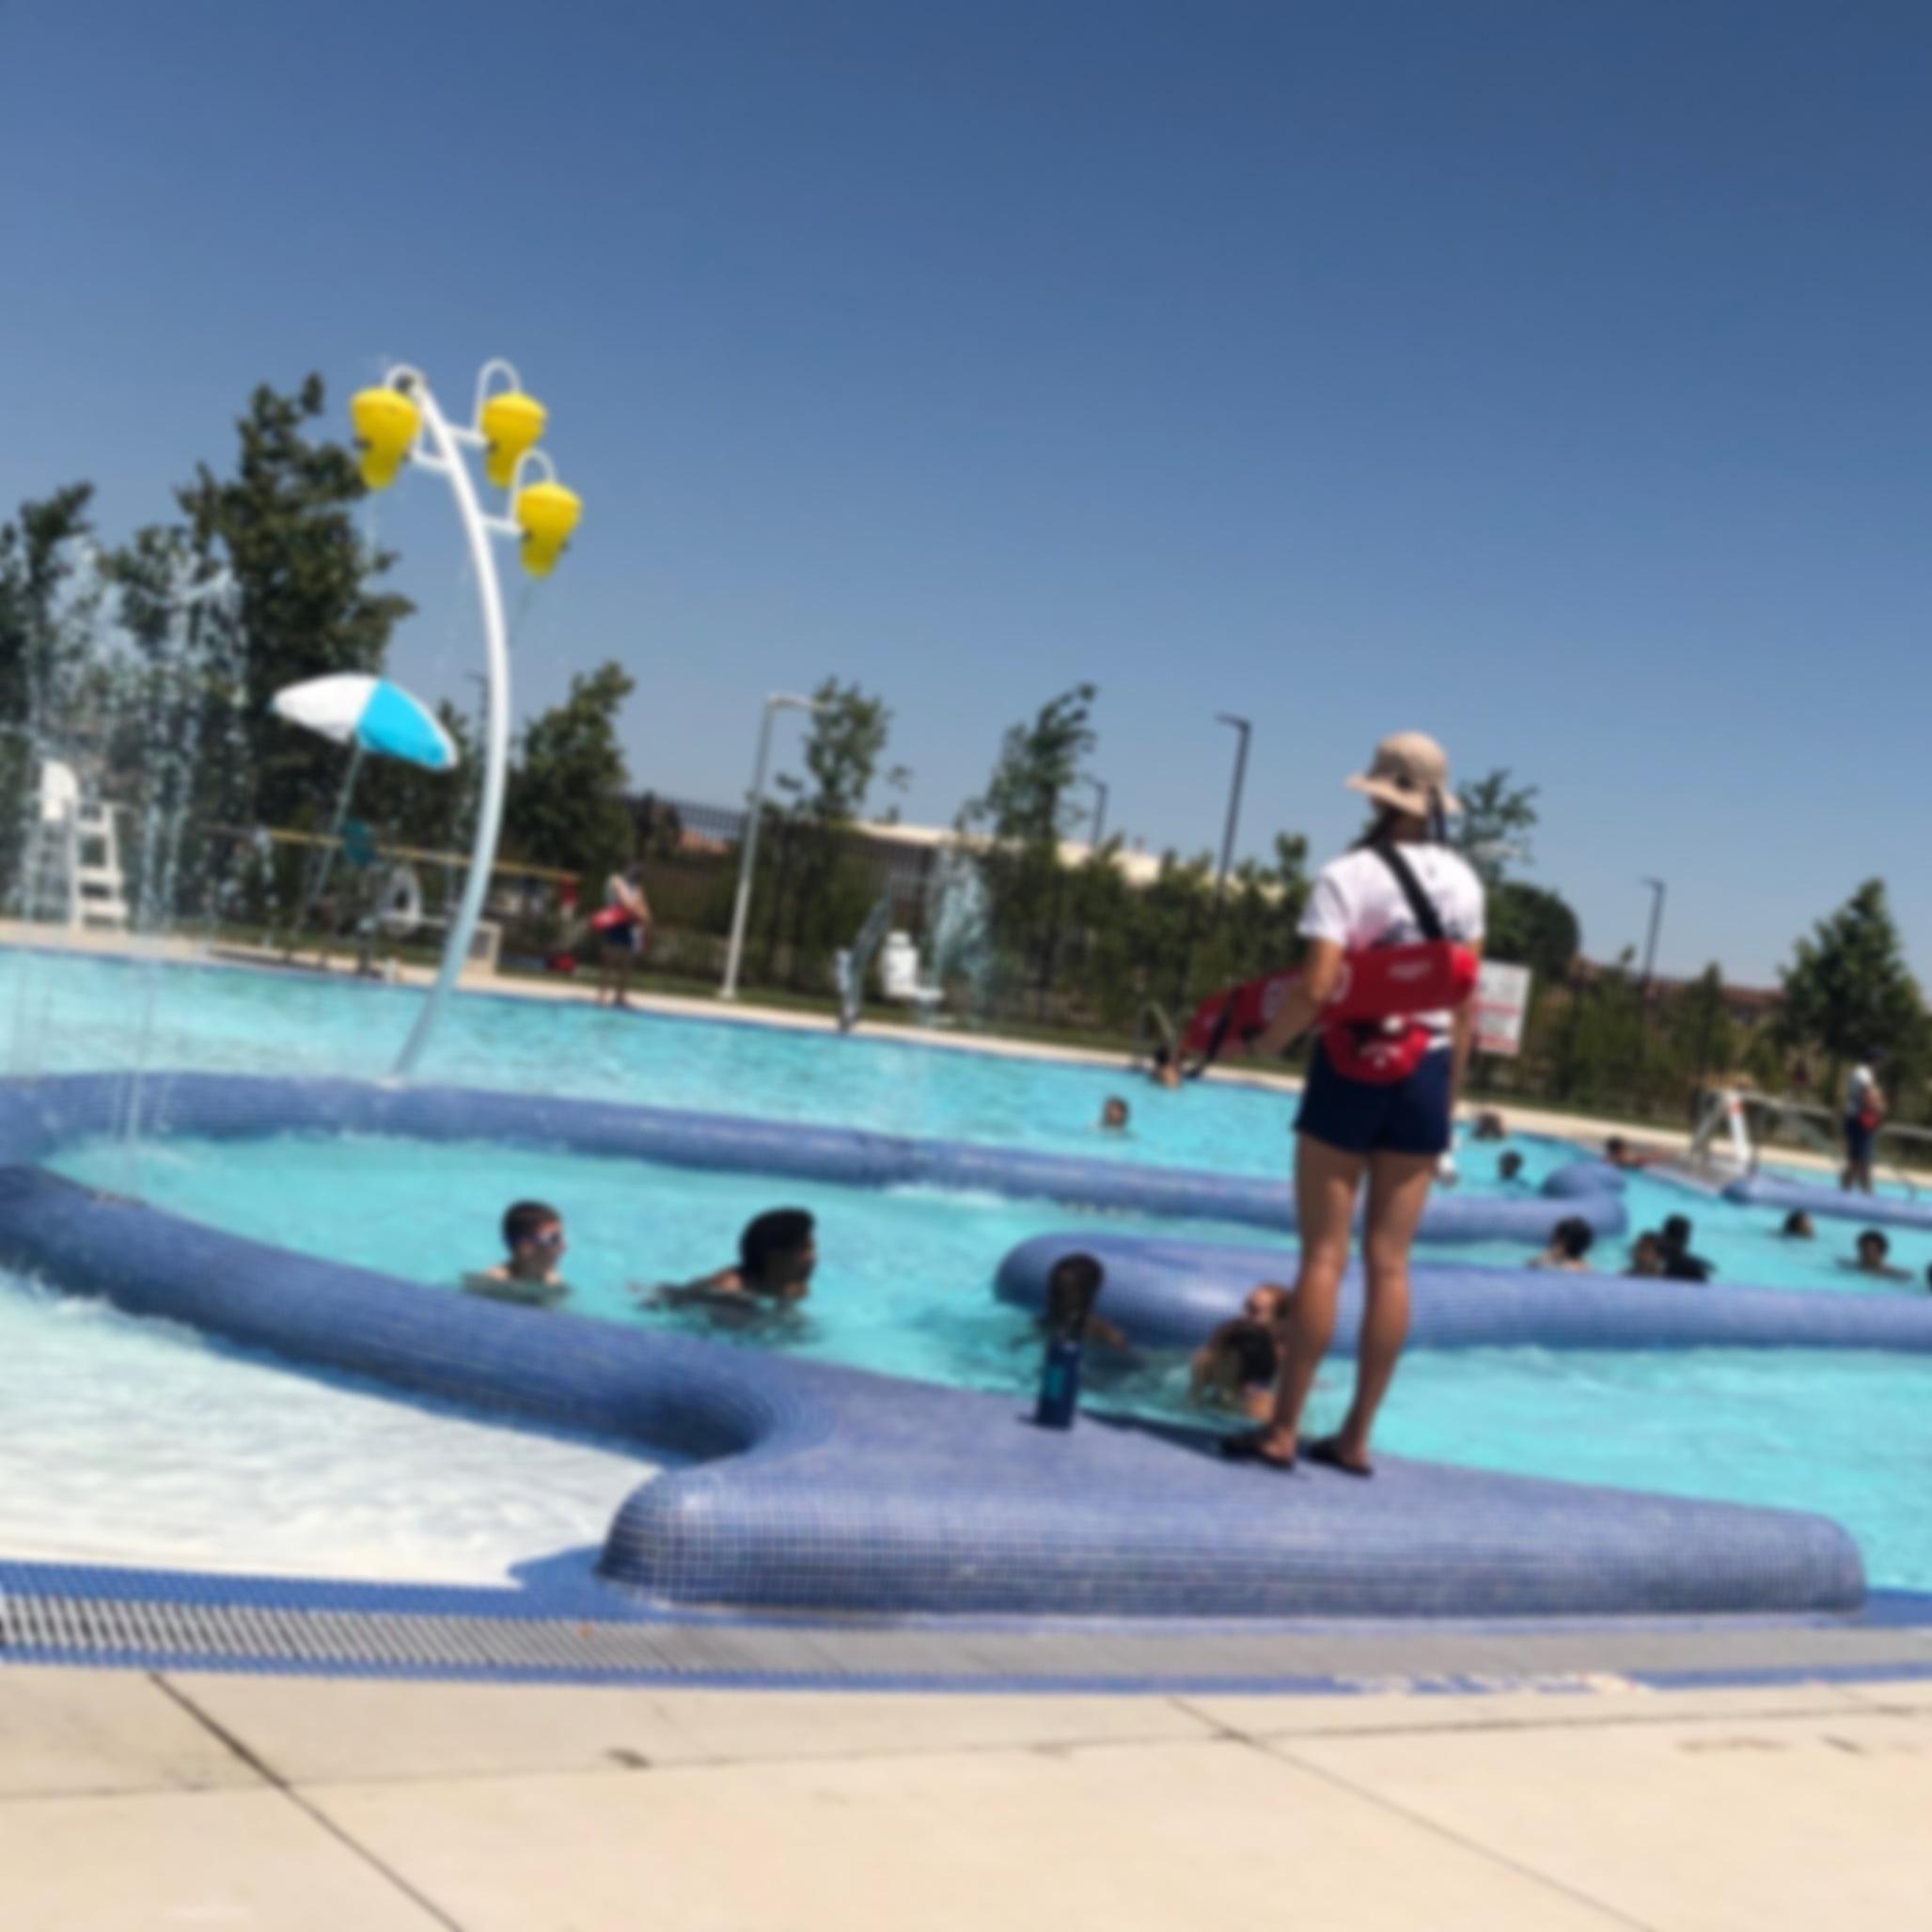 Elk+Grove+Aquatics+Center+for+Summer+Fun+-+Elk+Grove+CA+-+fortheloveofmom.jpg